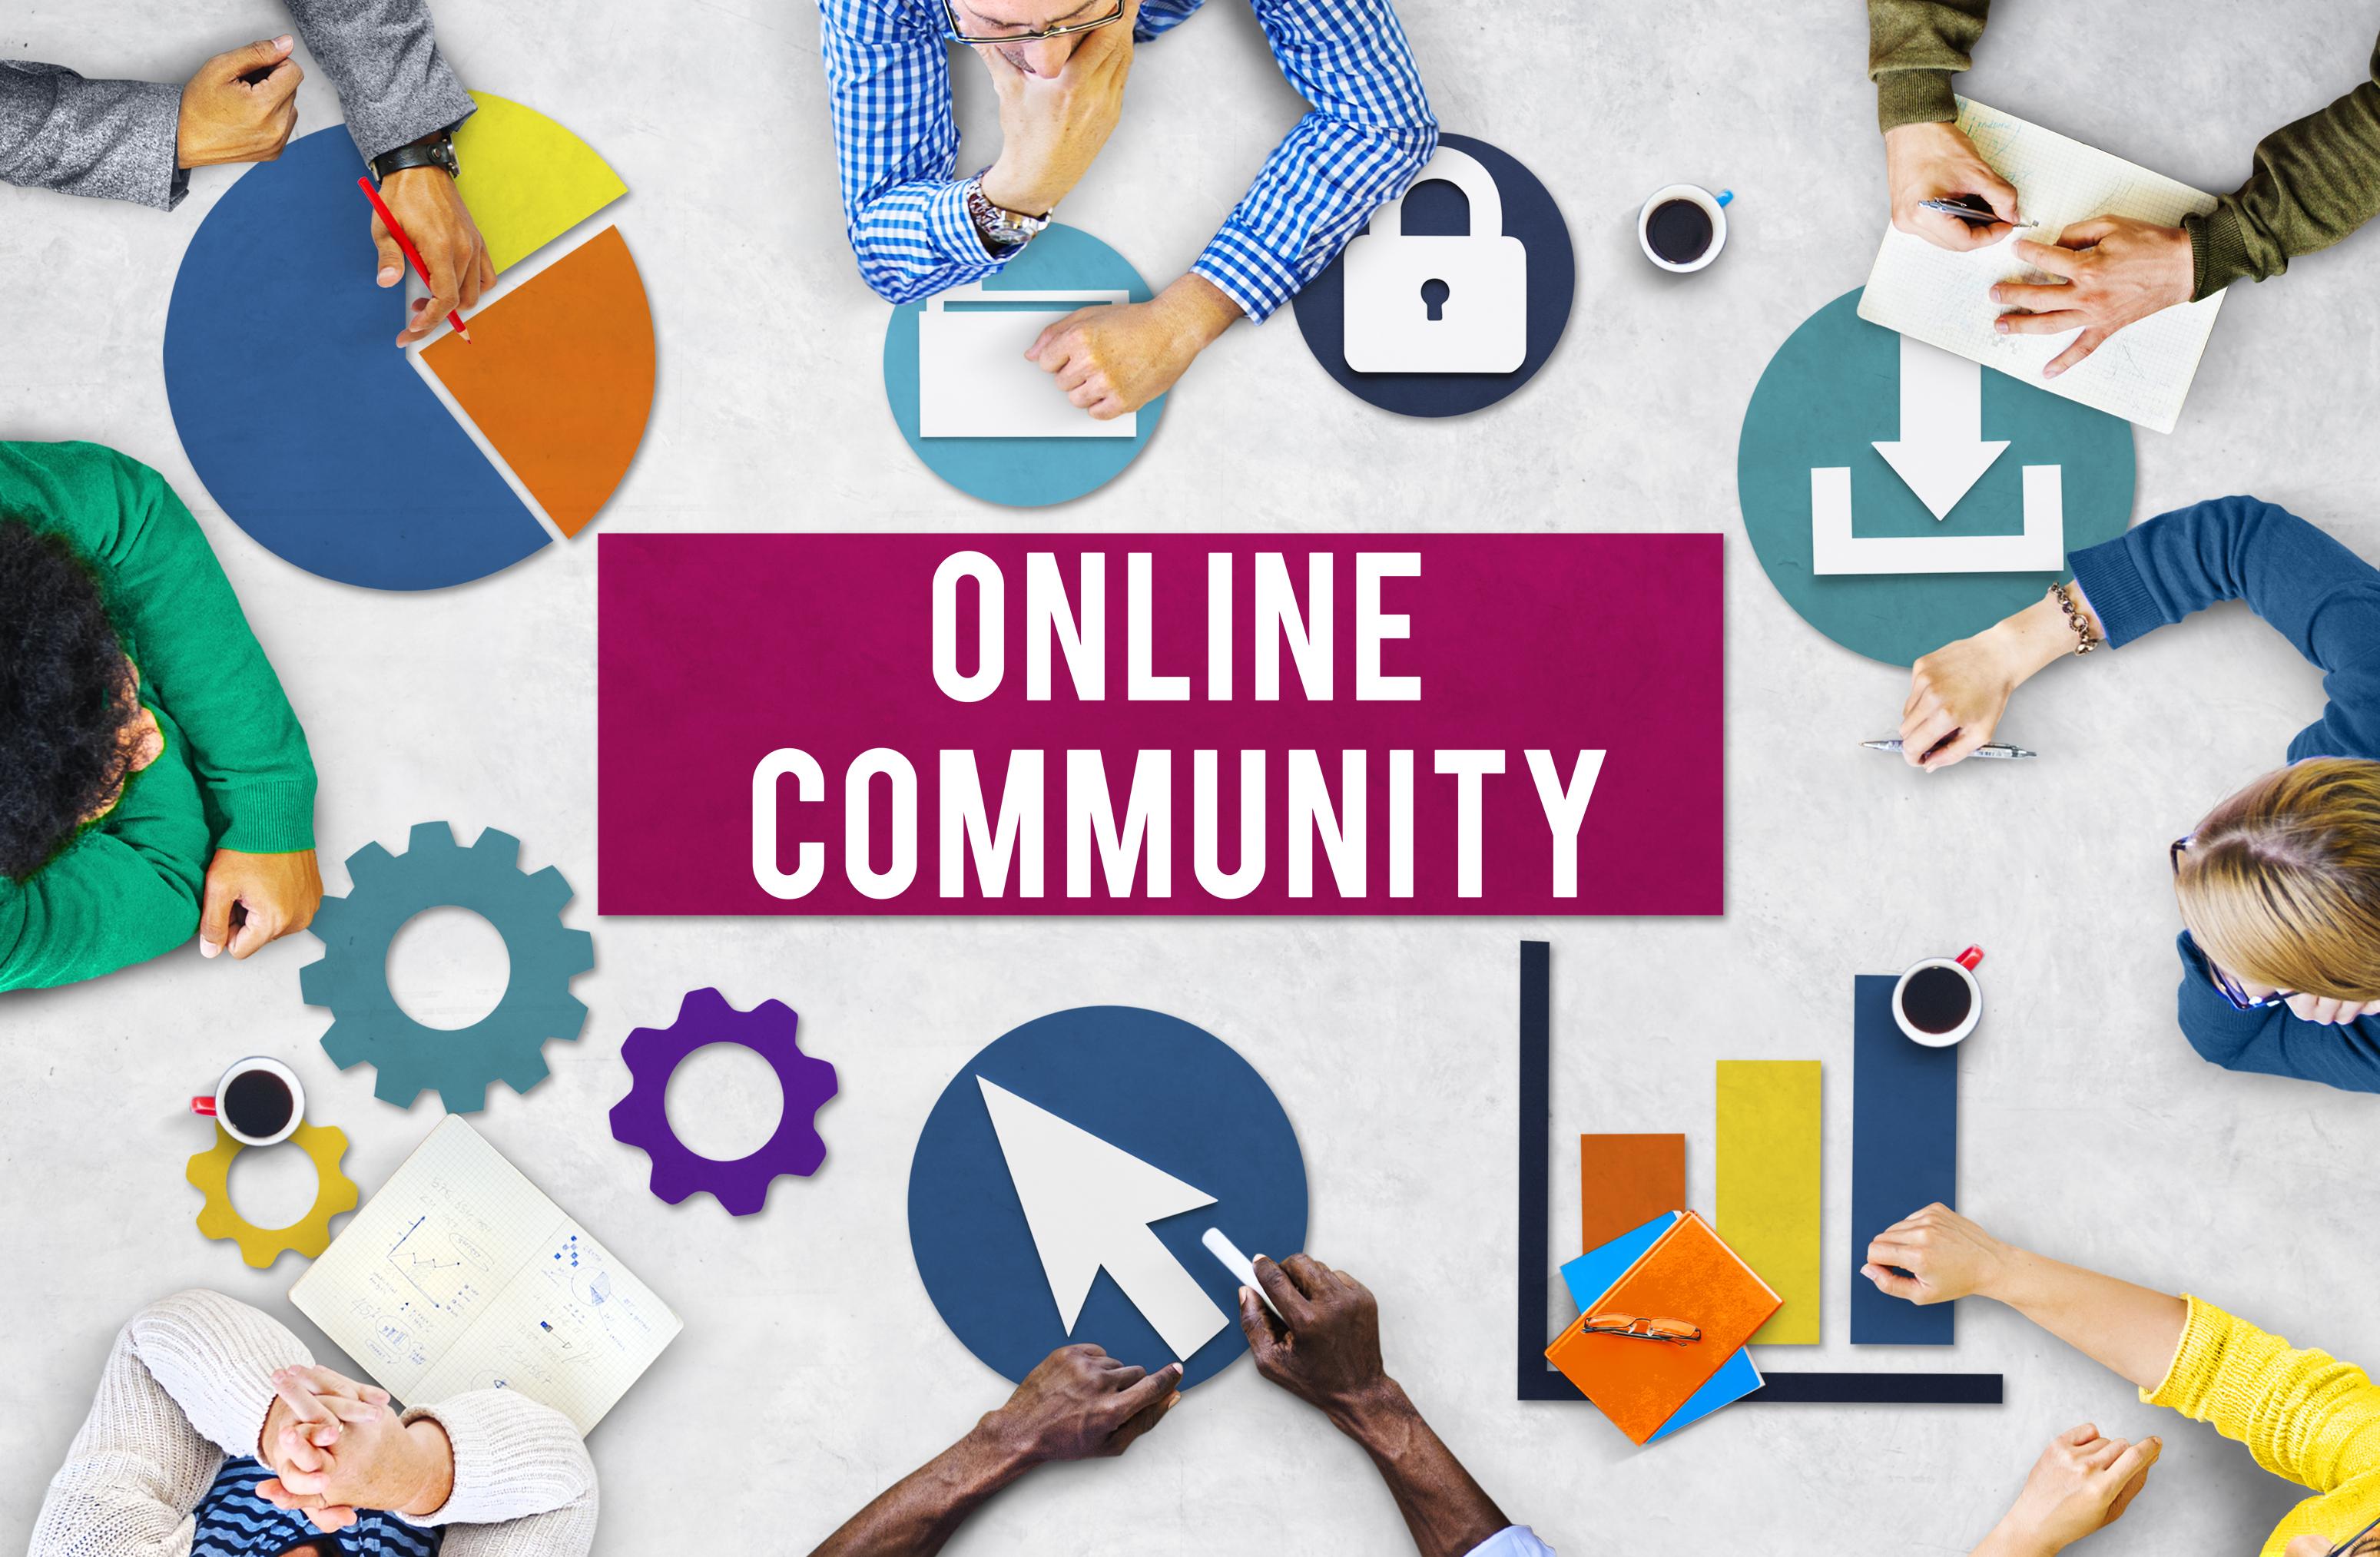 minding online community